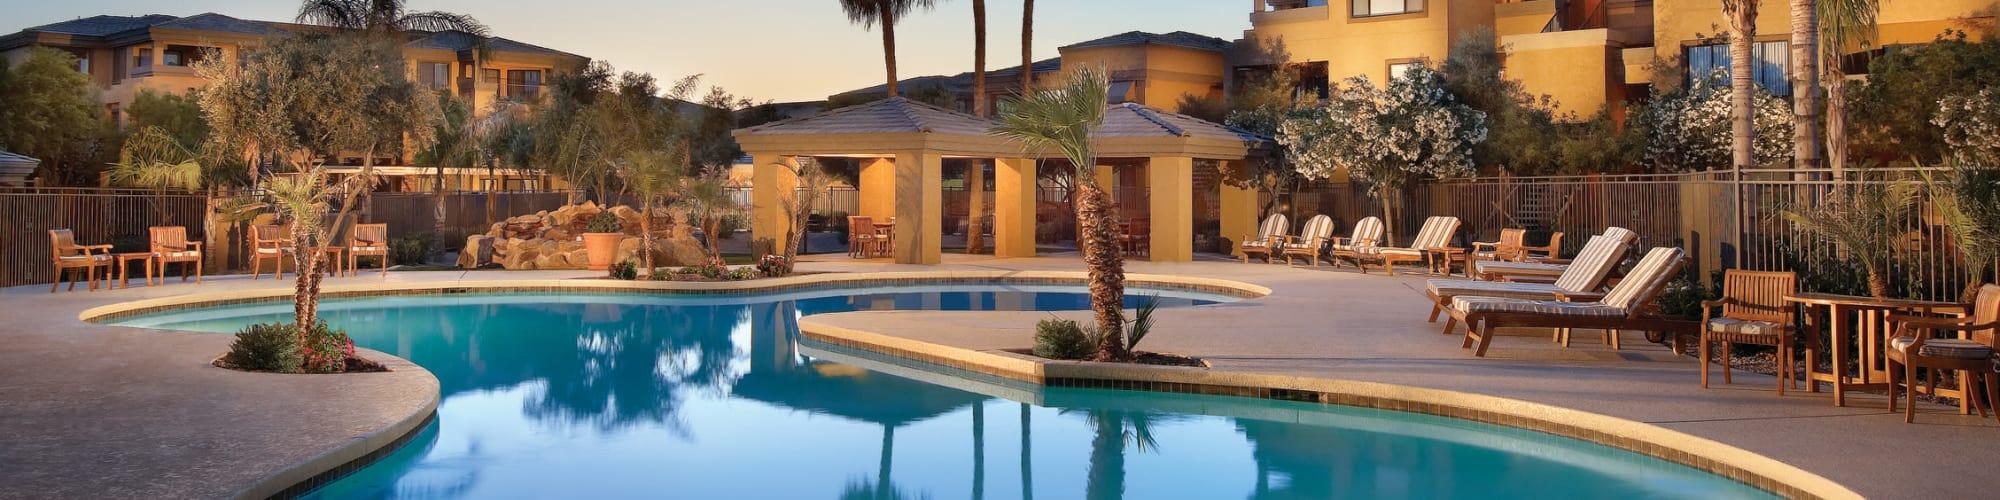 Photos of Waterside at Ocotillo in Chandler, Arizona